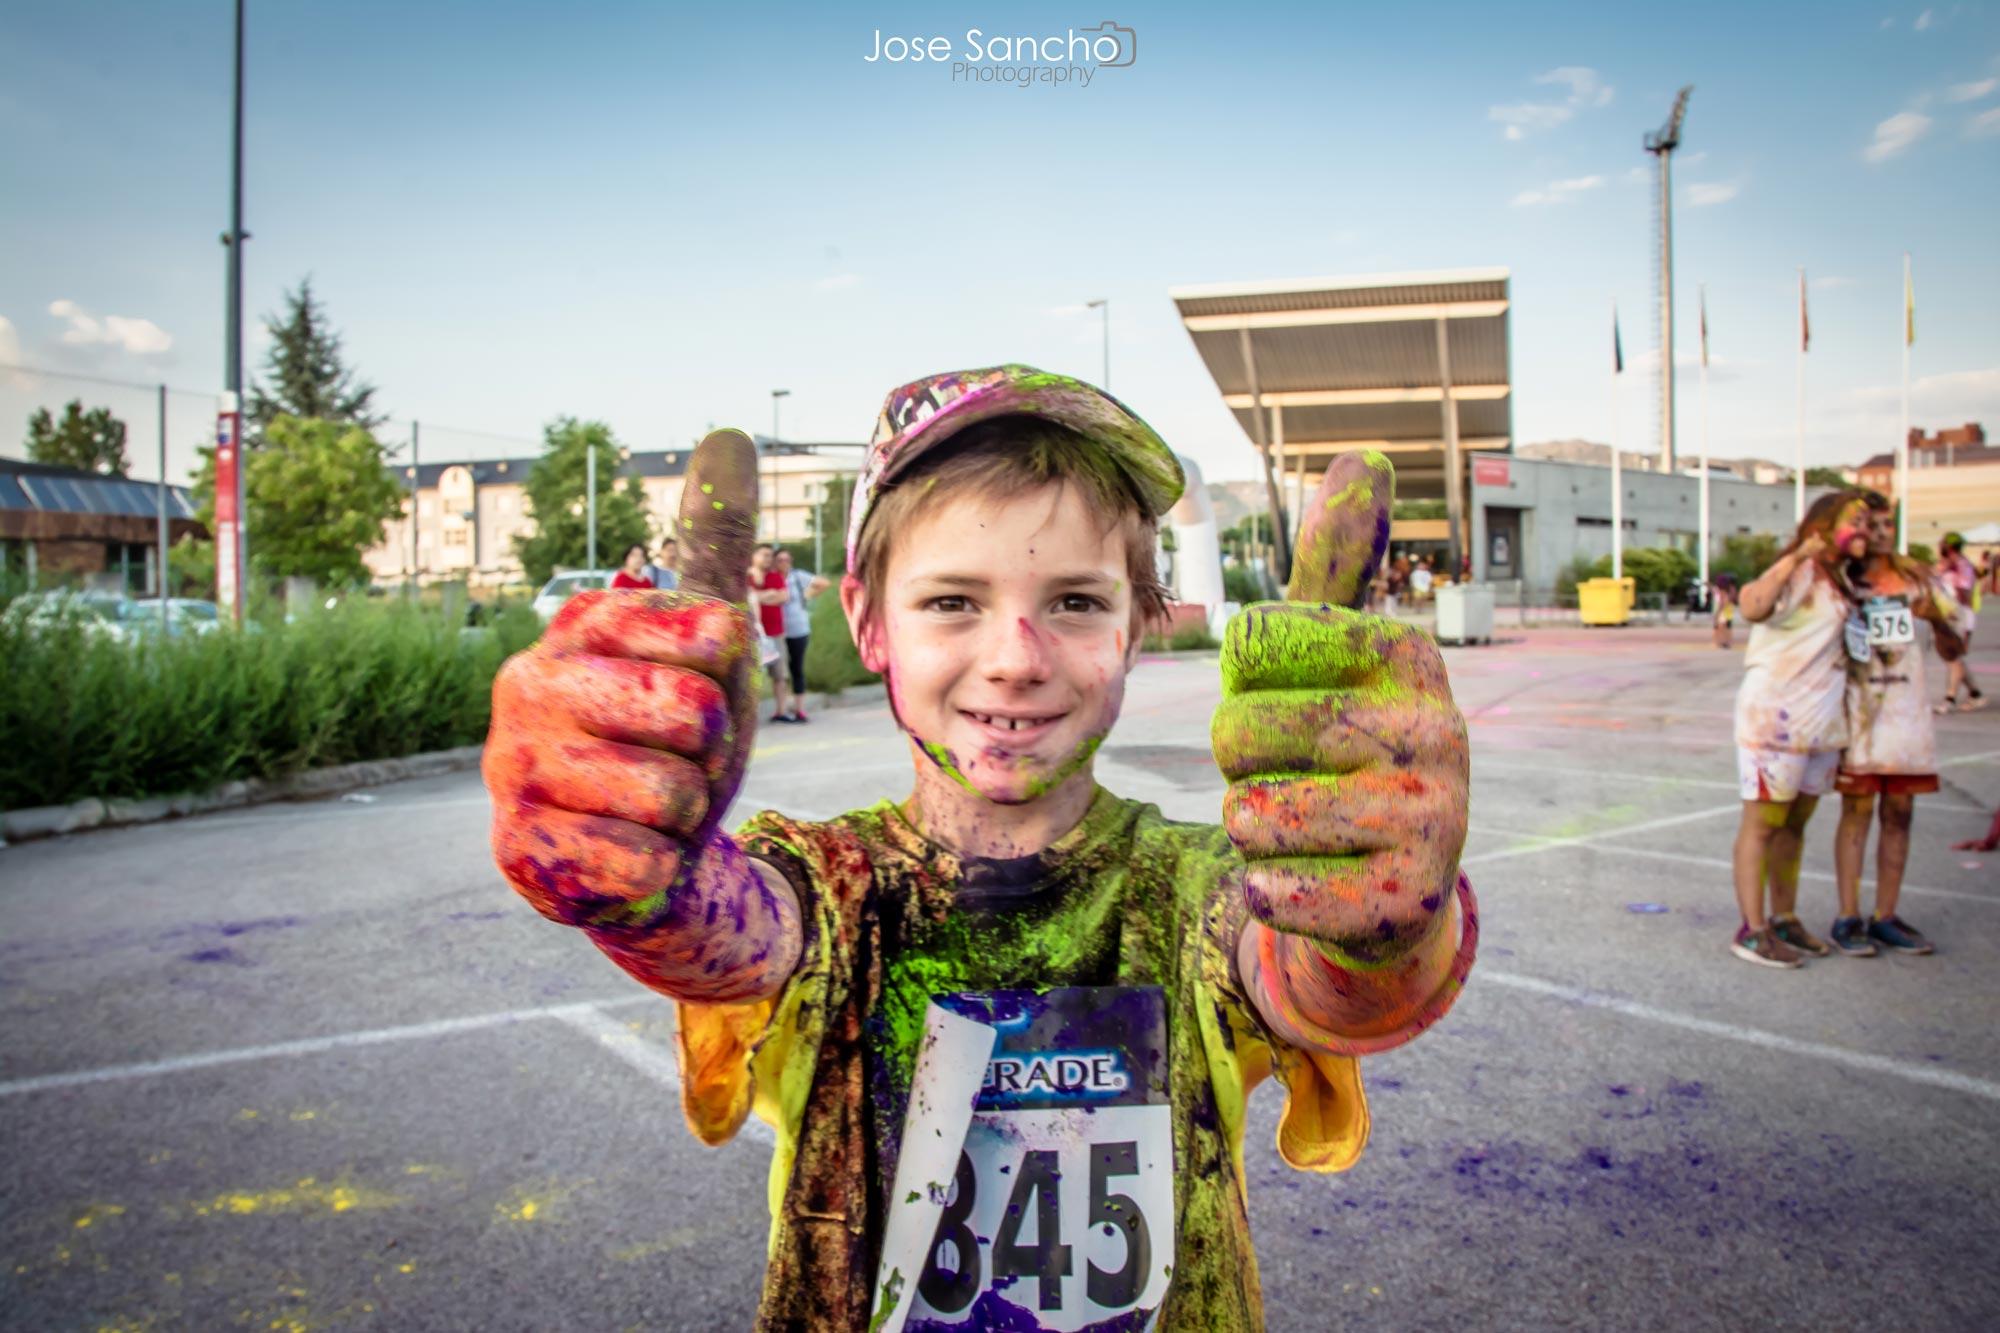 Jaime - Jose Sancho Photography